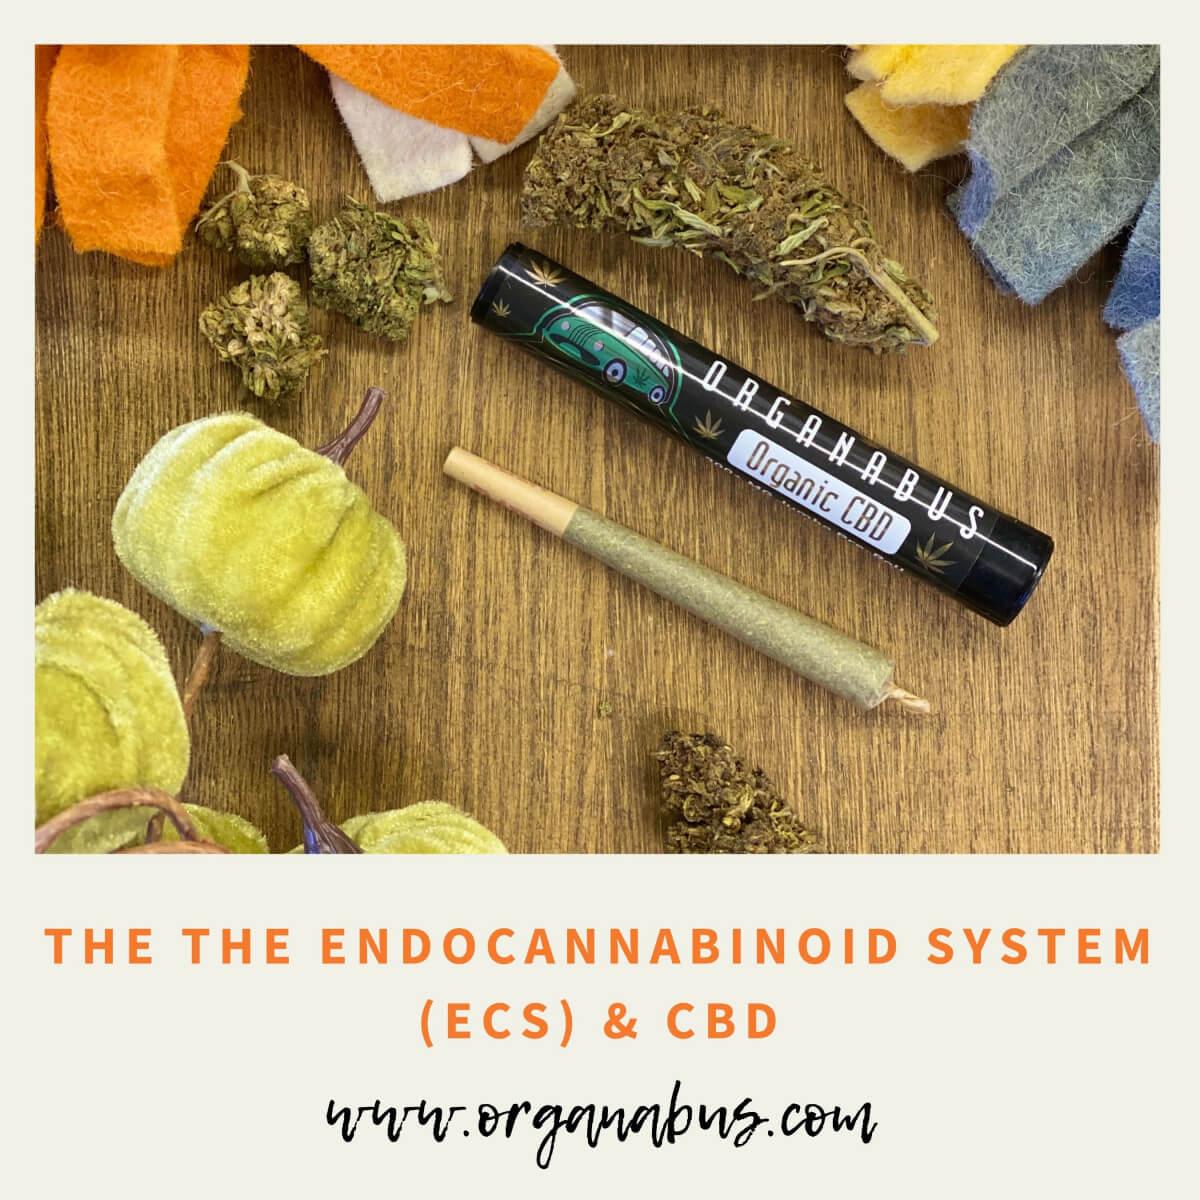 The Endocannabinoid System: Unlocking the Mystery, Vol. I